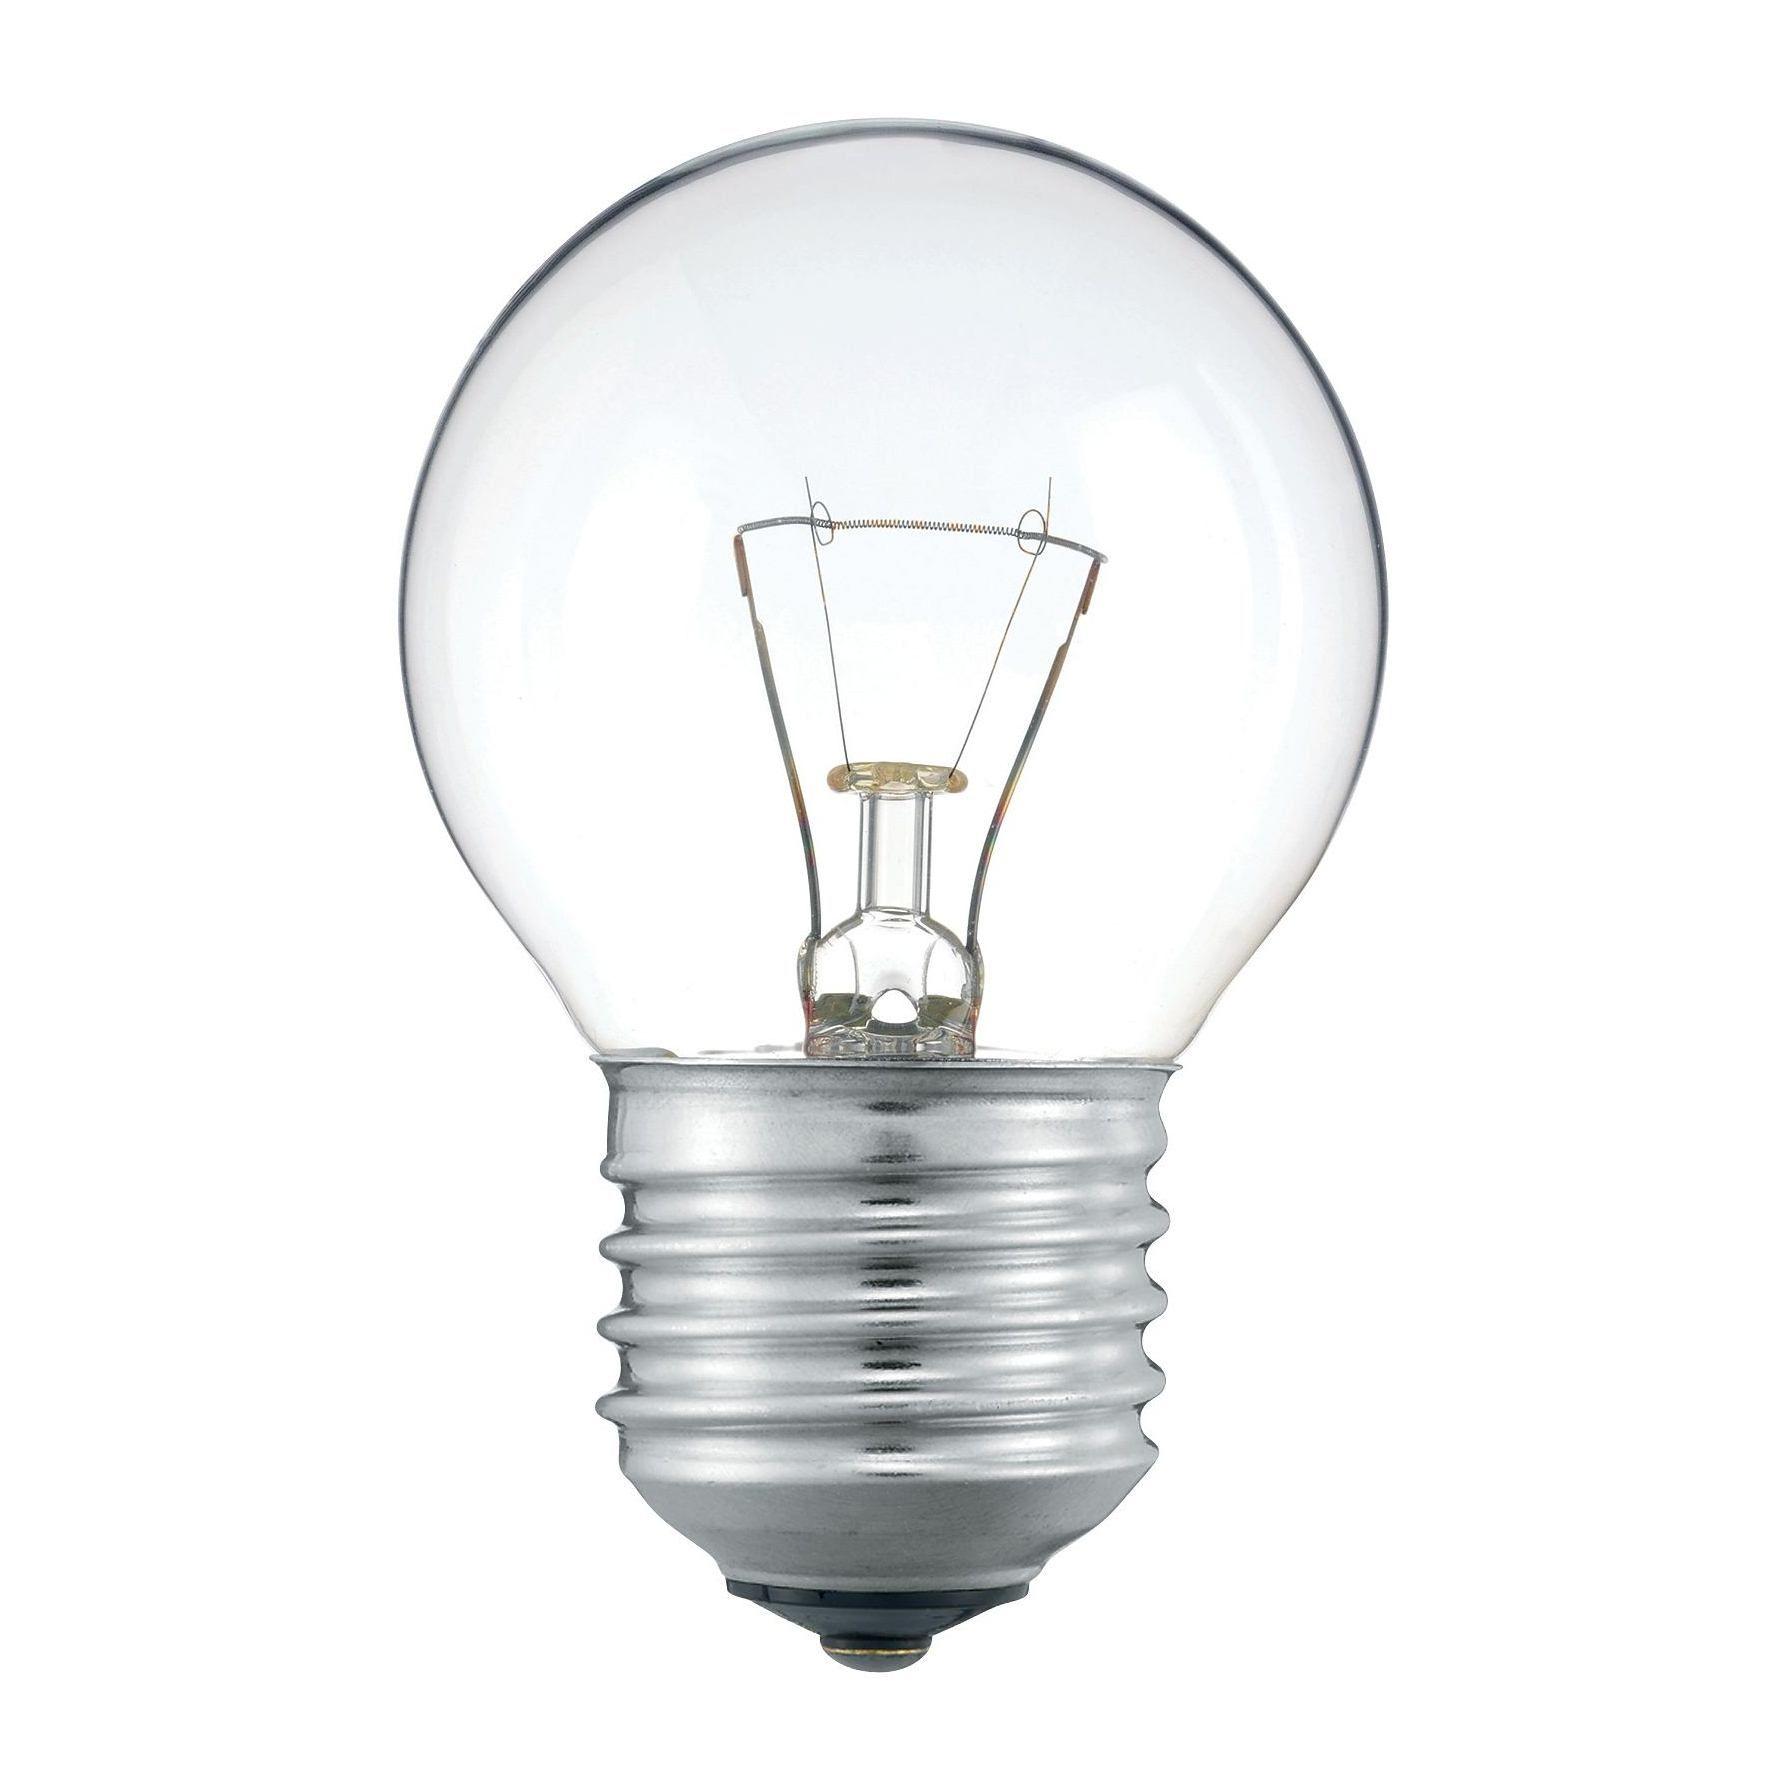 Купить Лампа накаливания Philips P45 40W 230V E27 CL.1CT/10X10F прозрачная